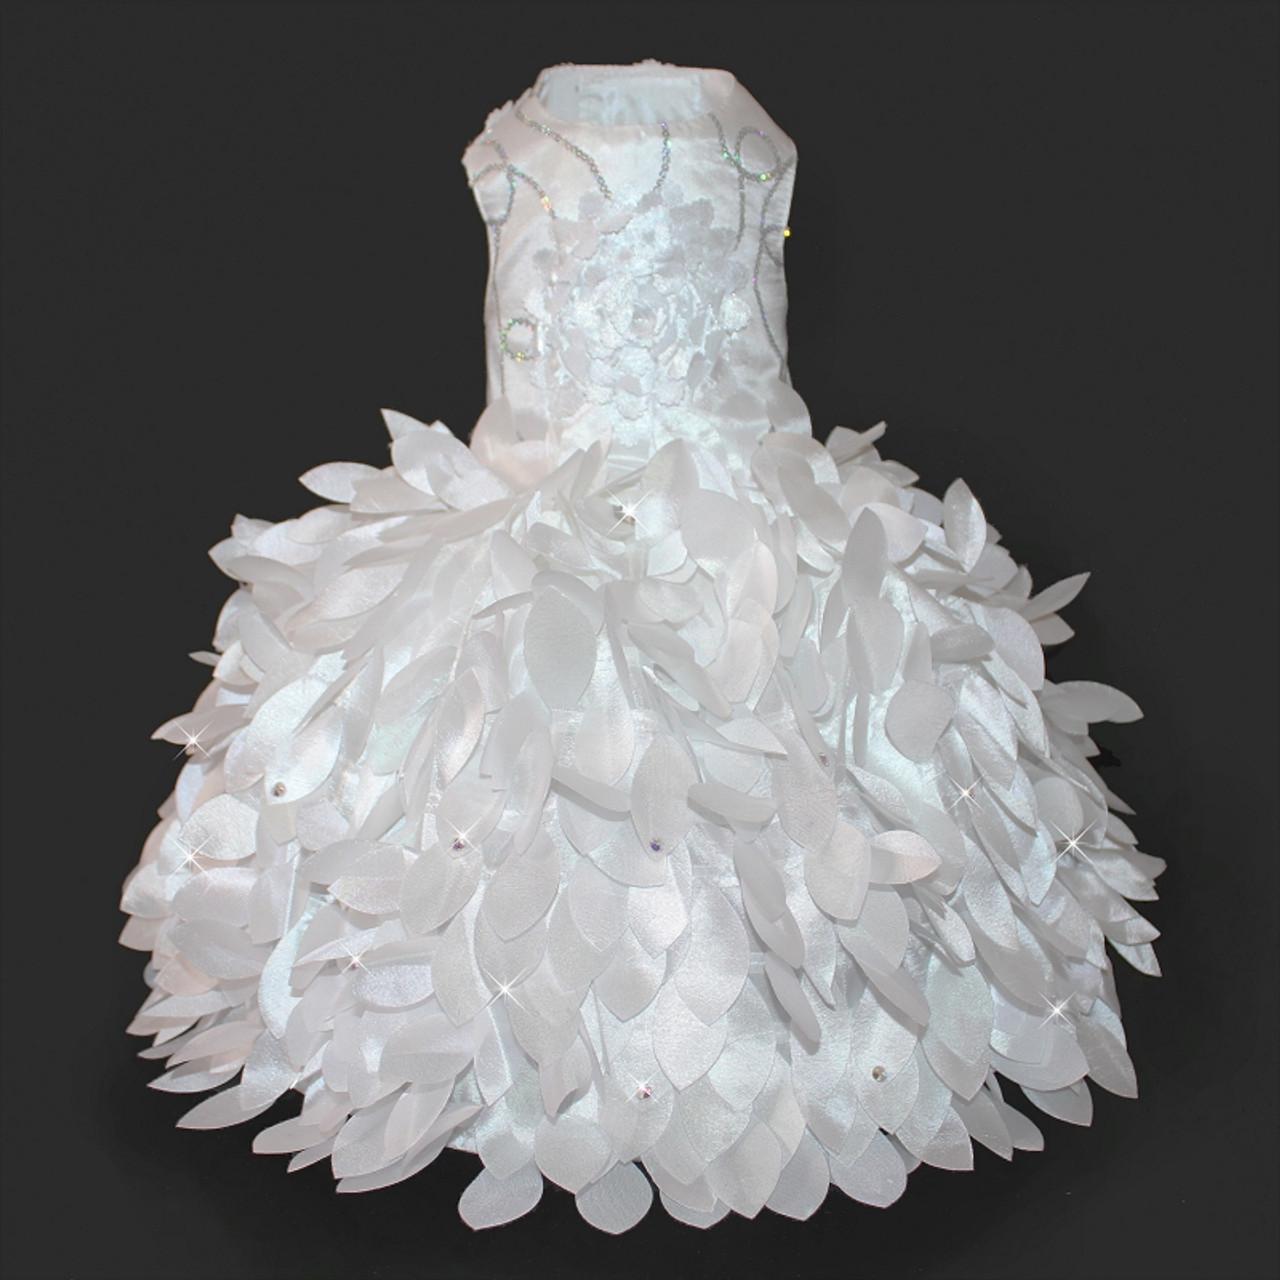 Cinderella Wedding Dress From New York